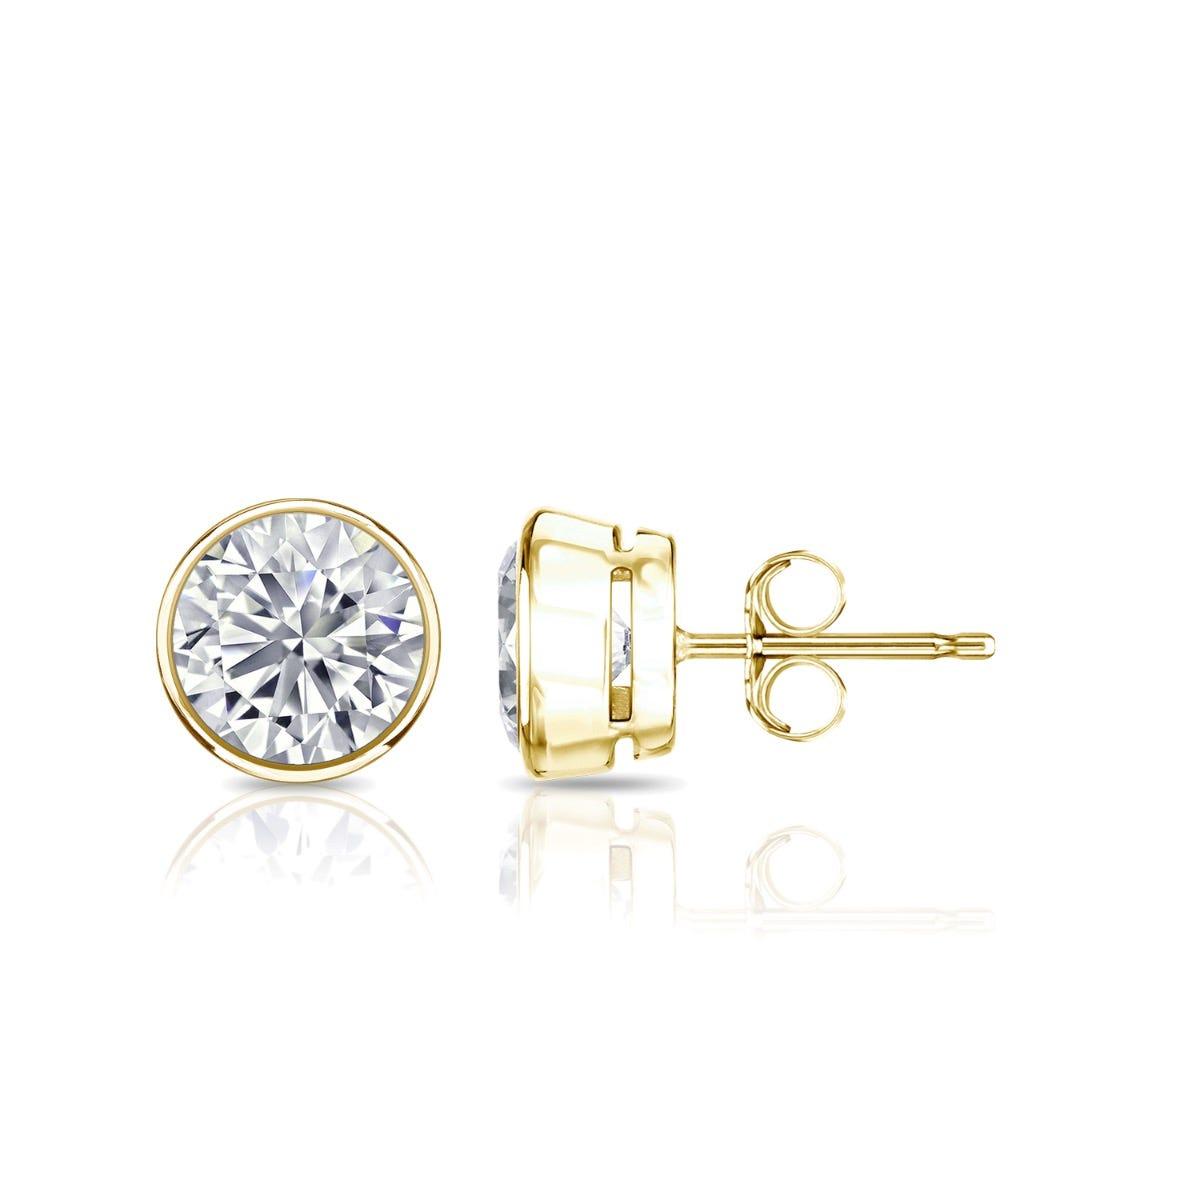 Diamond Round Bezel-Set 1ctw. Solitaire Stud (IJ-I2) Earrings in 14K Yellow Gold